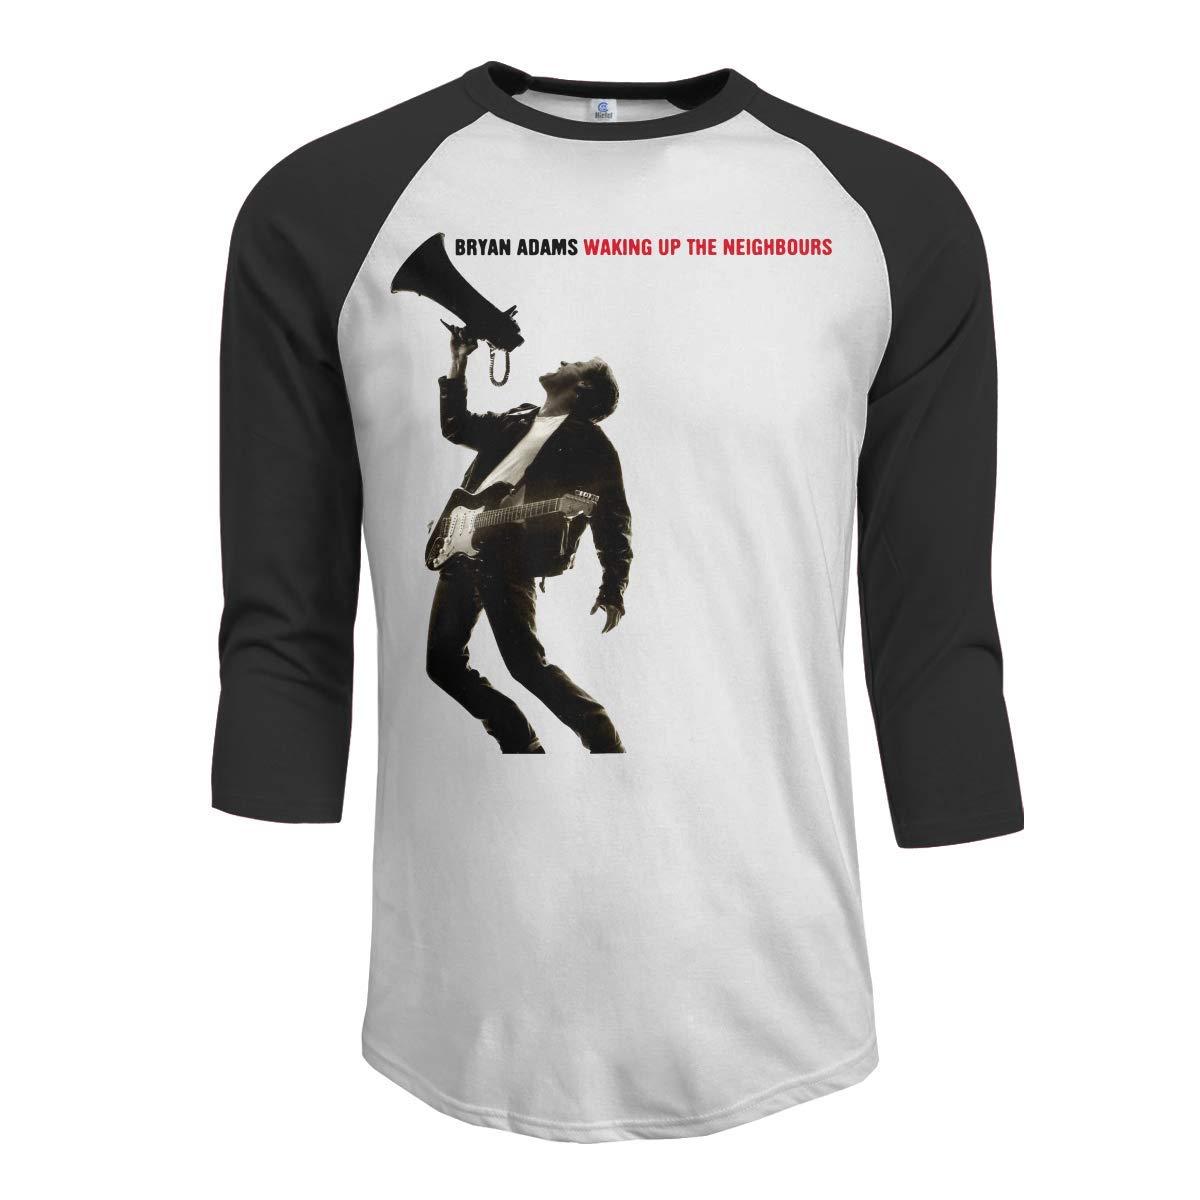 YANNAN Mens Bryan Adams Waking Up The Neighbours 3//4 Sleeve Raglan Baseball T-Shirt Black